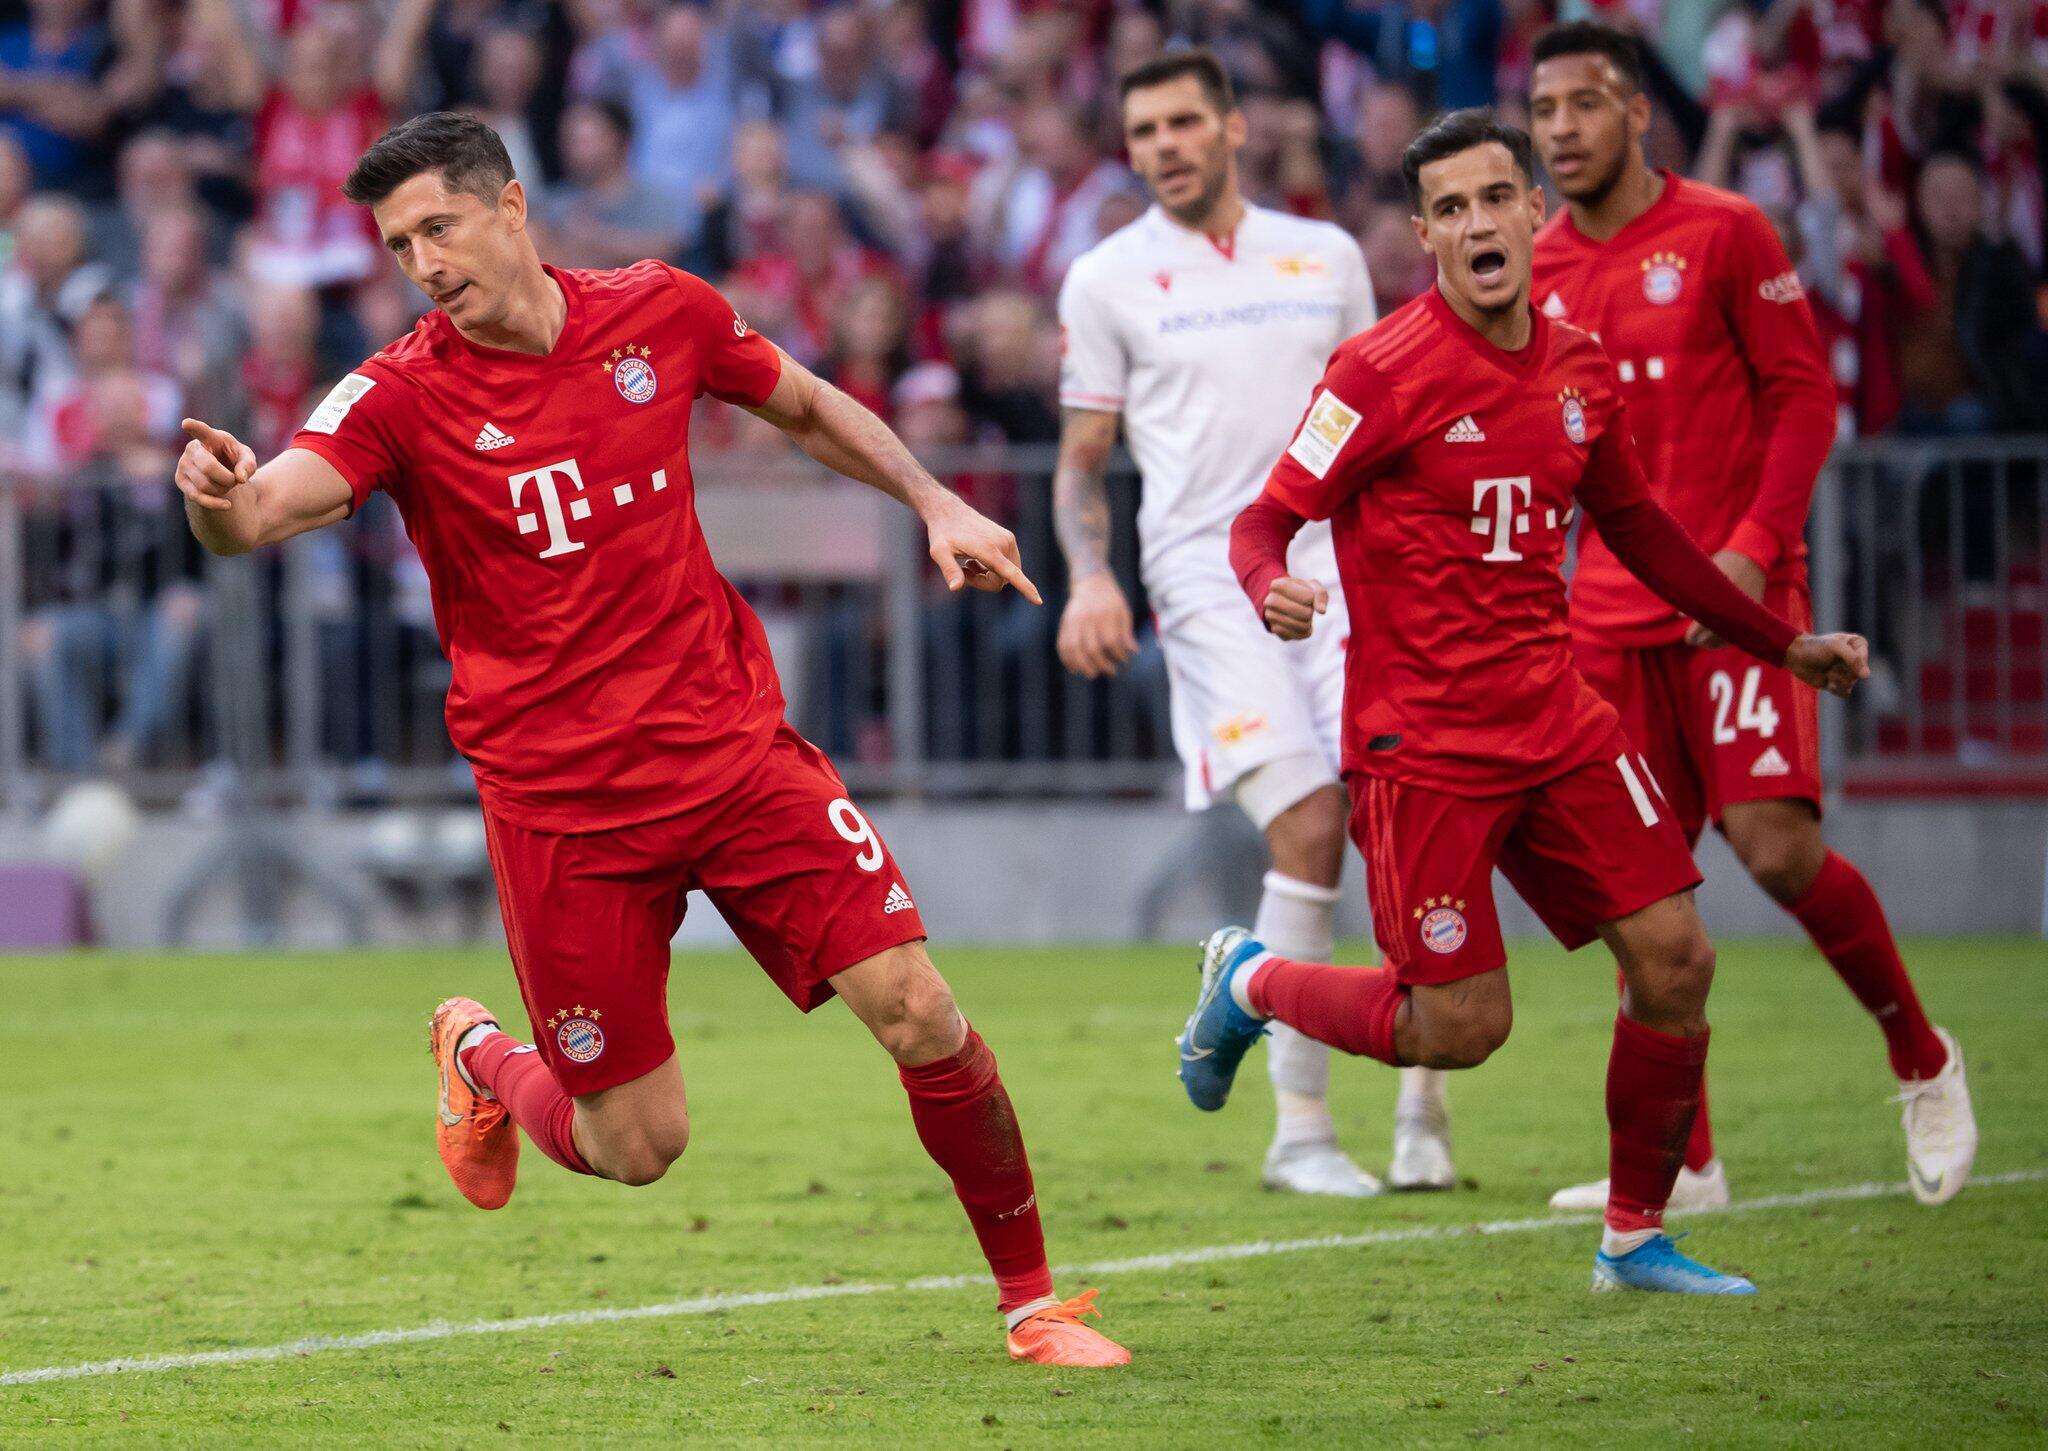 Bild zu Bayern Munich - 1st FC Union Berlin